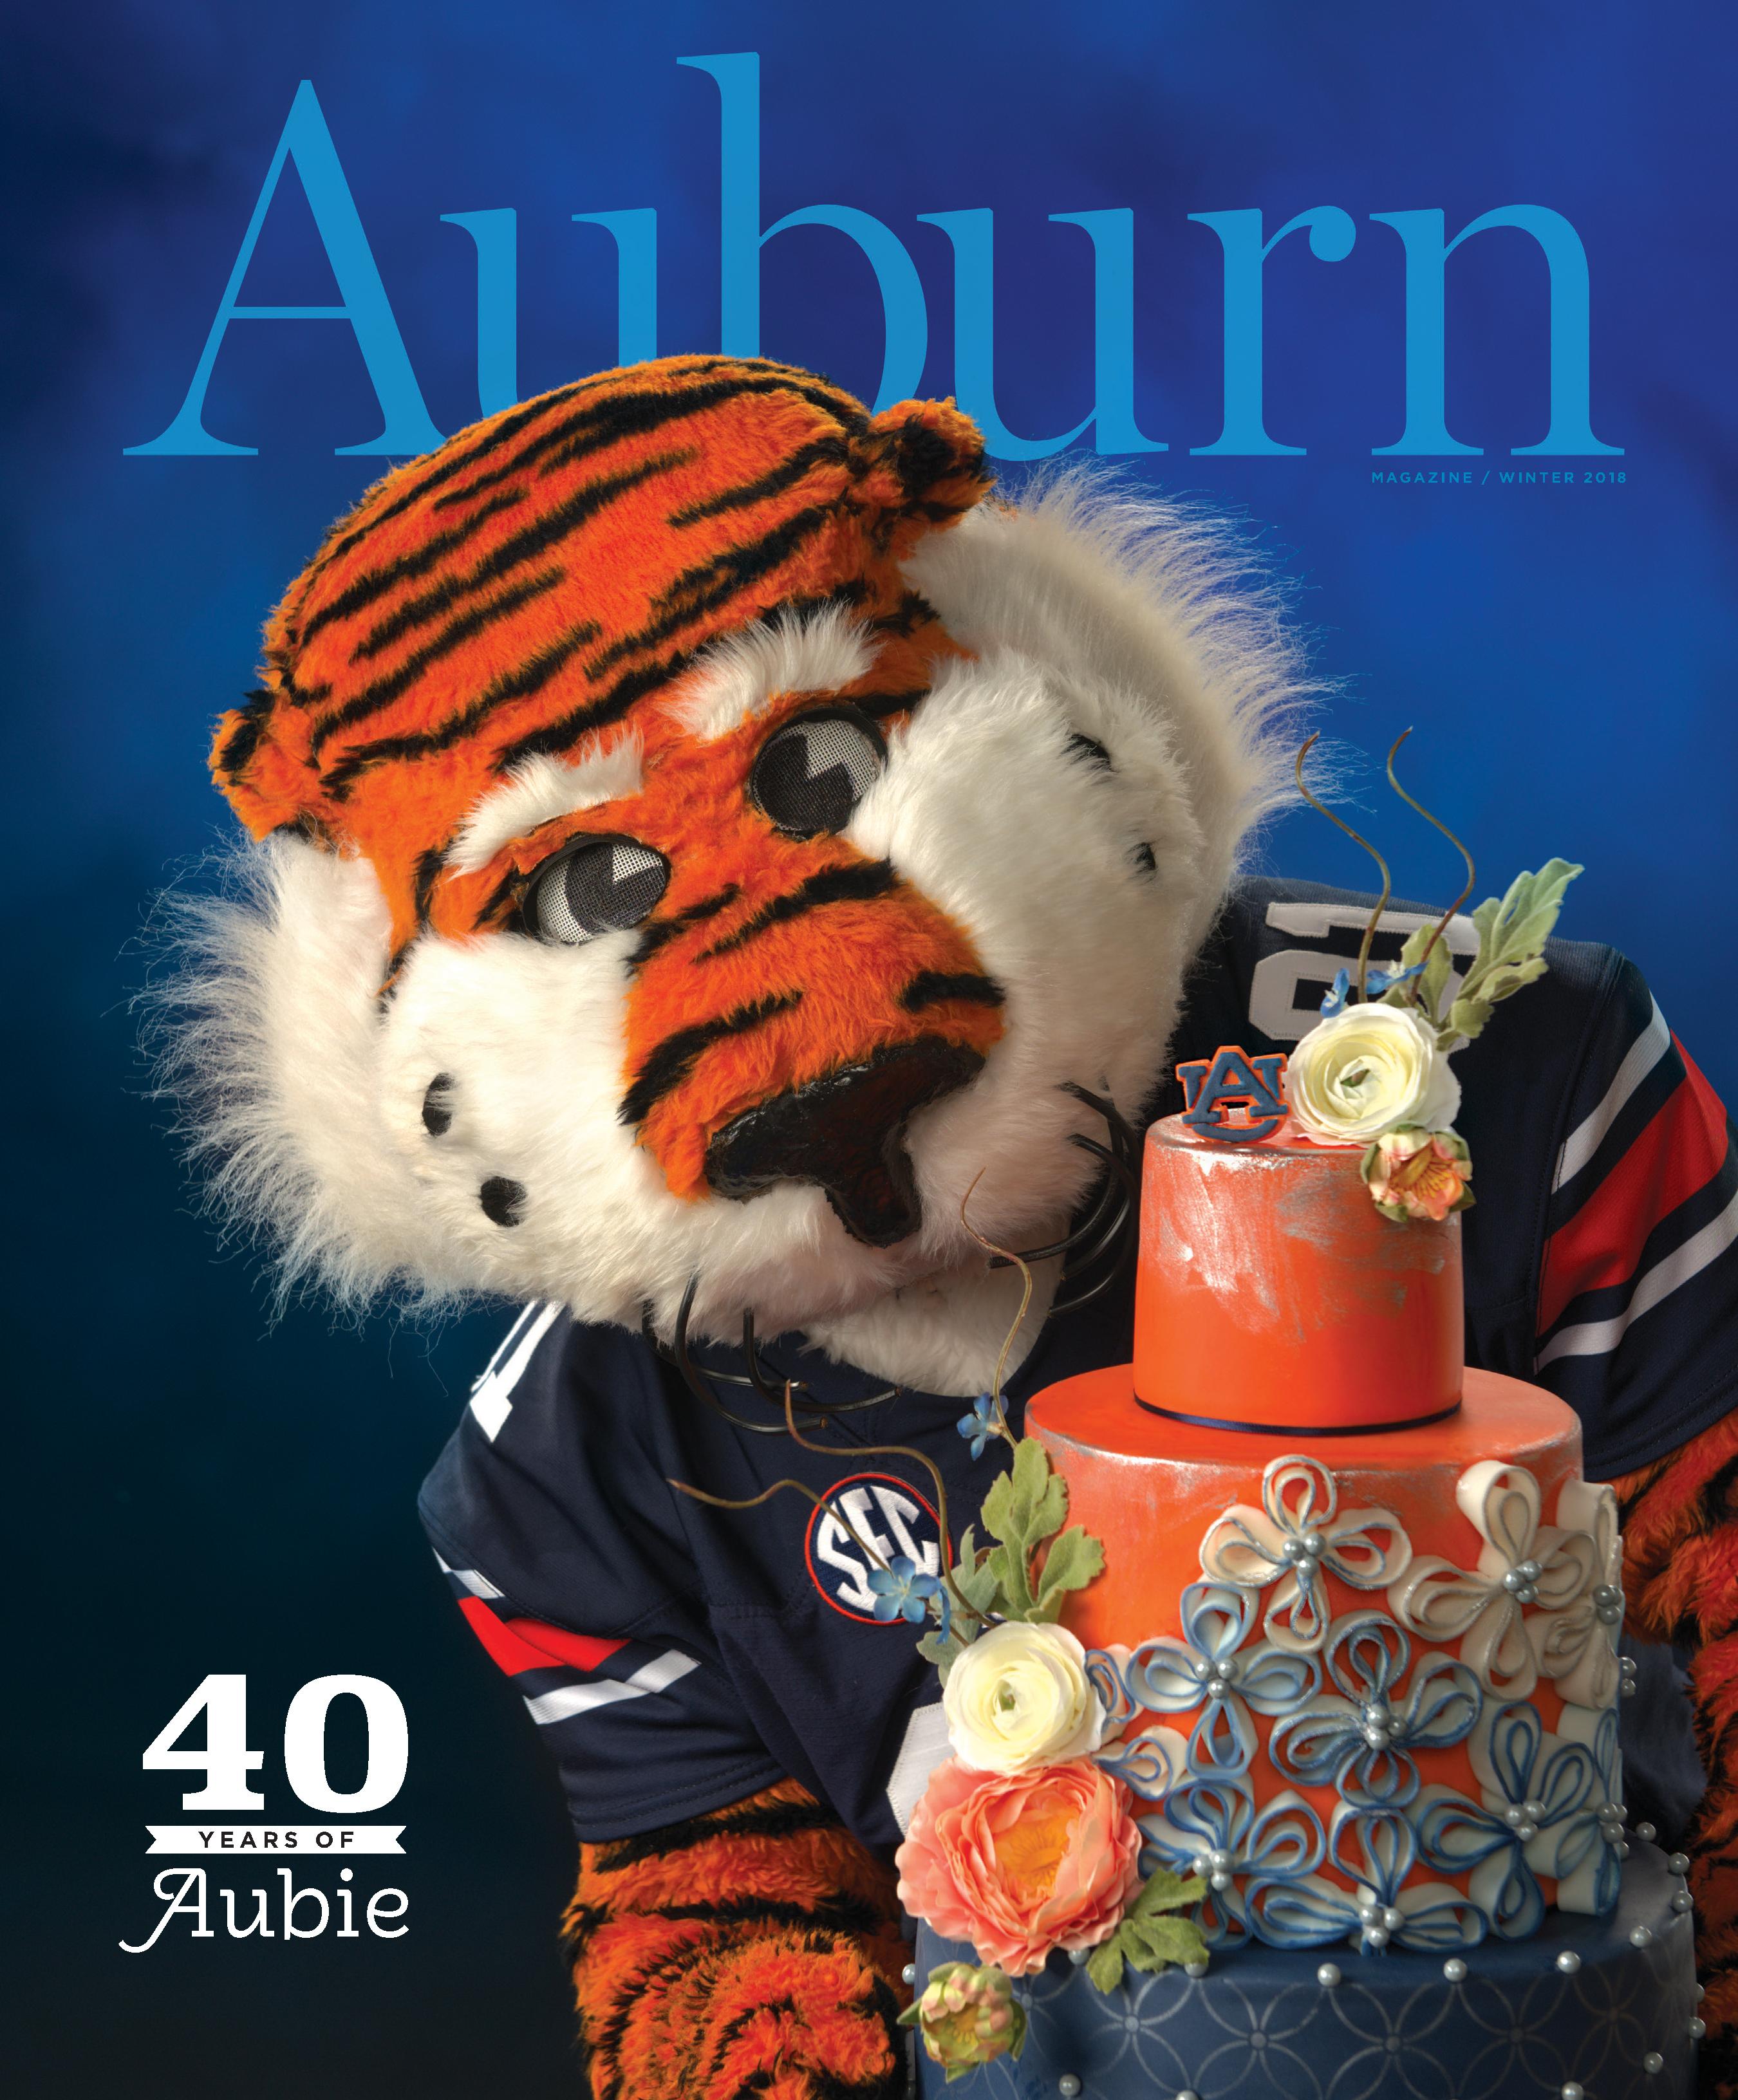 Auburn Magazine Winter 2018 40 Years of Aubie; Aubie holding a cake